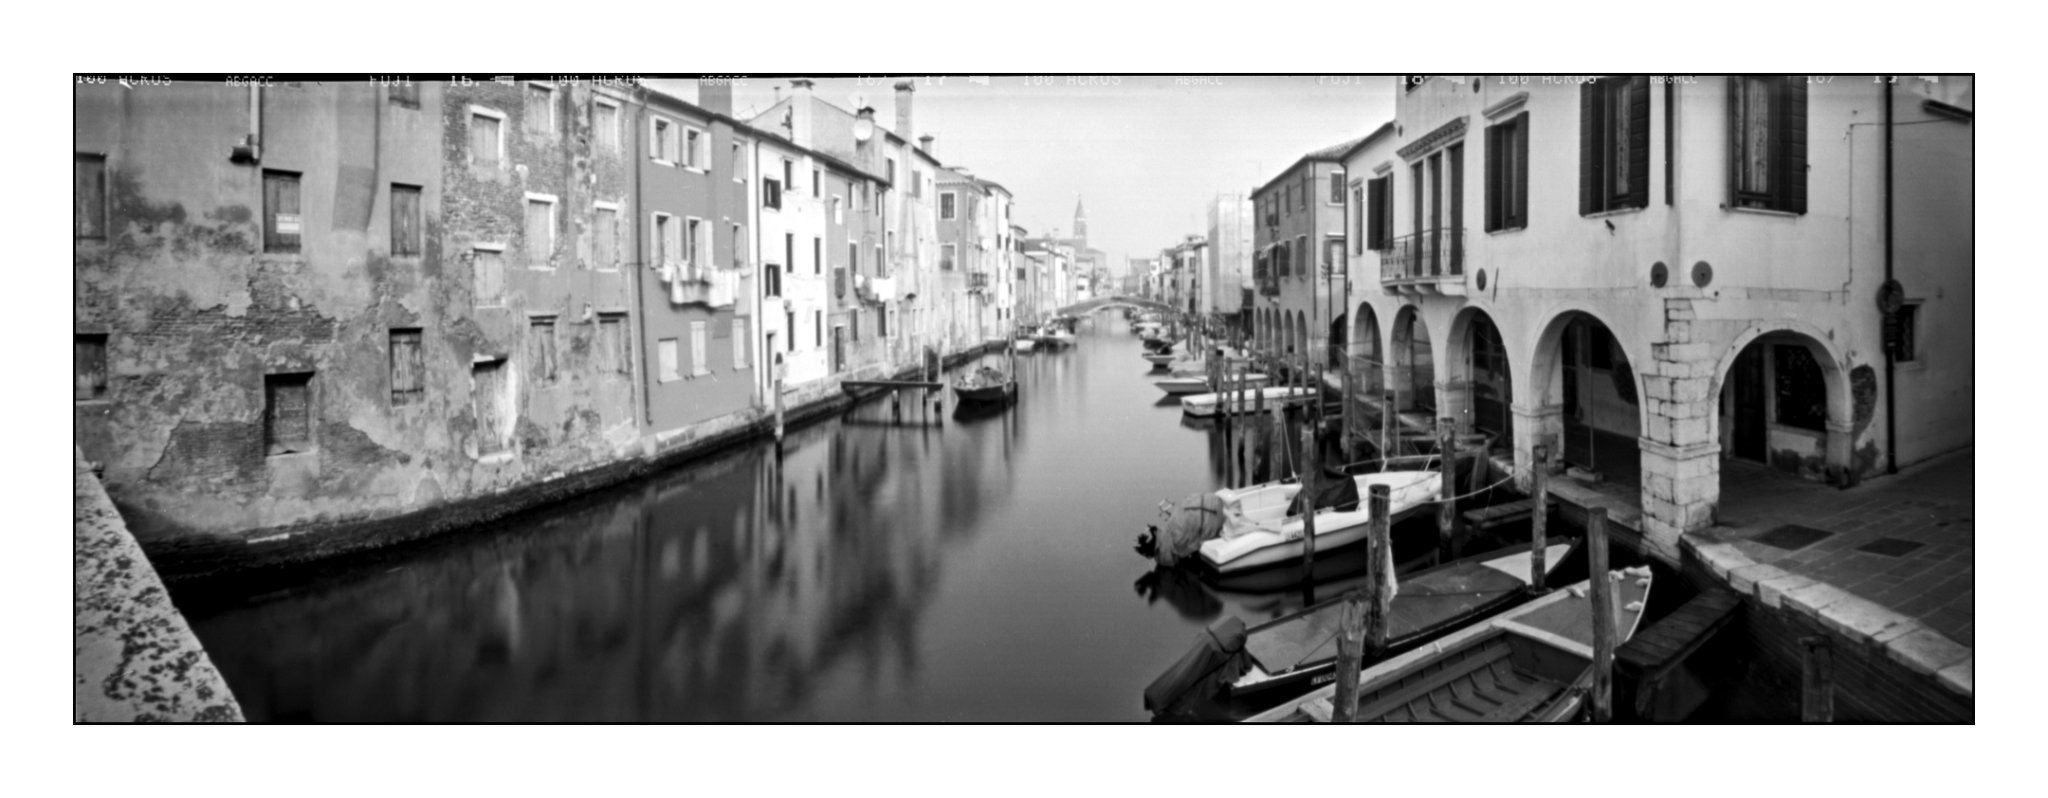 Chioggia, Lochkamera 16x7 analog: Venedig, Fotograf: Steffen Lohse